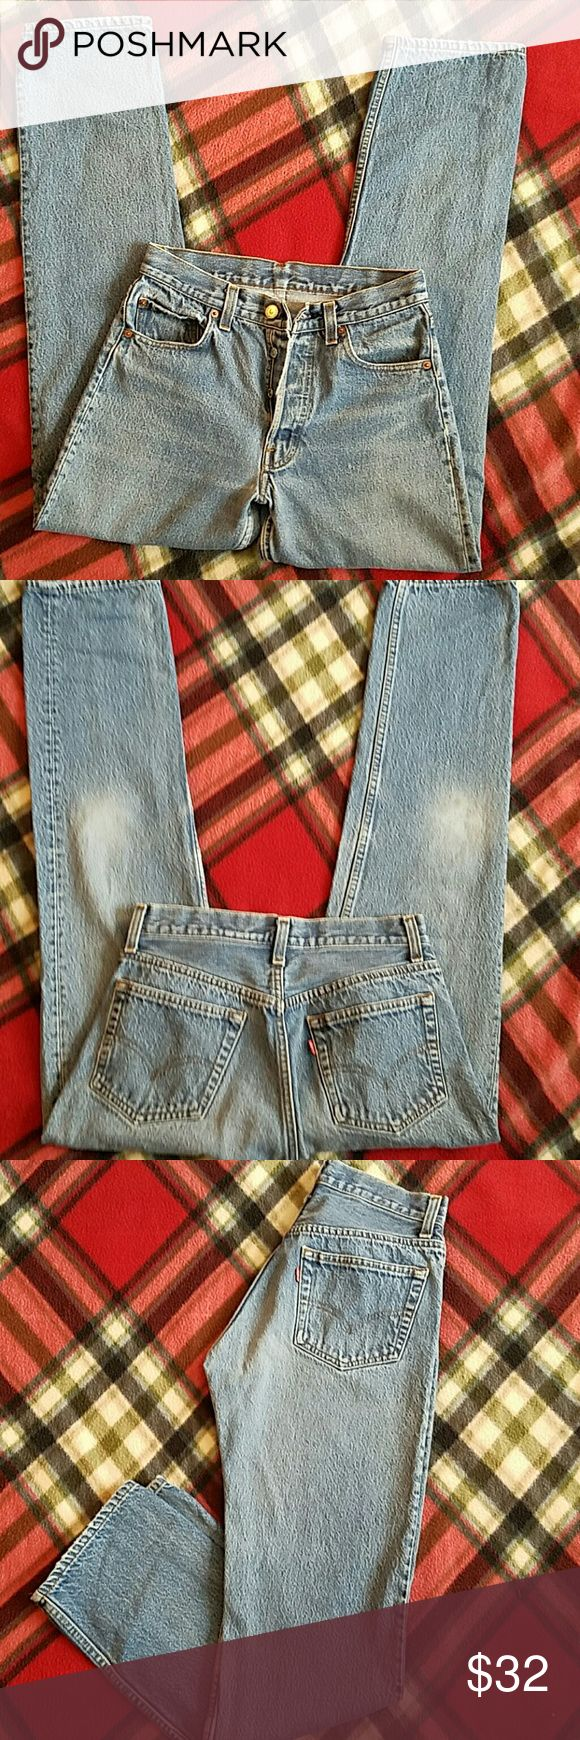 VINTAGE LEVI'S 501 BUTTONFLY JEANS VINTAGE DISTRESSED LEVI 501 BUTTONFLY  JEANS NO TAGS 26W 30L LEVI 501 Jeans